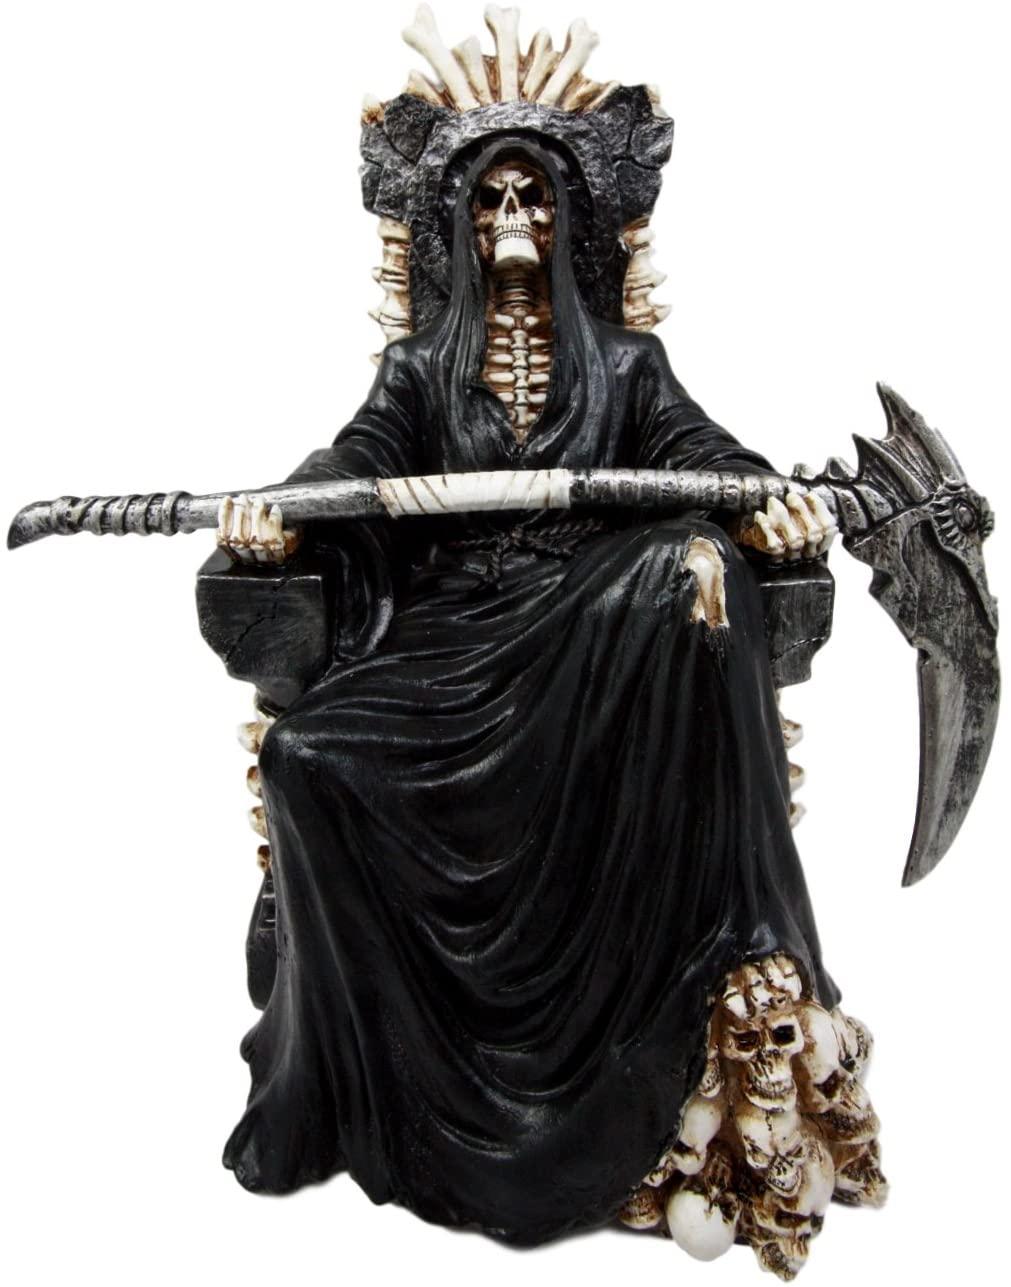 Ebros Gift Black Holy Death Grim Reaper Sitting On Skeleton Throne Figurine 10.5